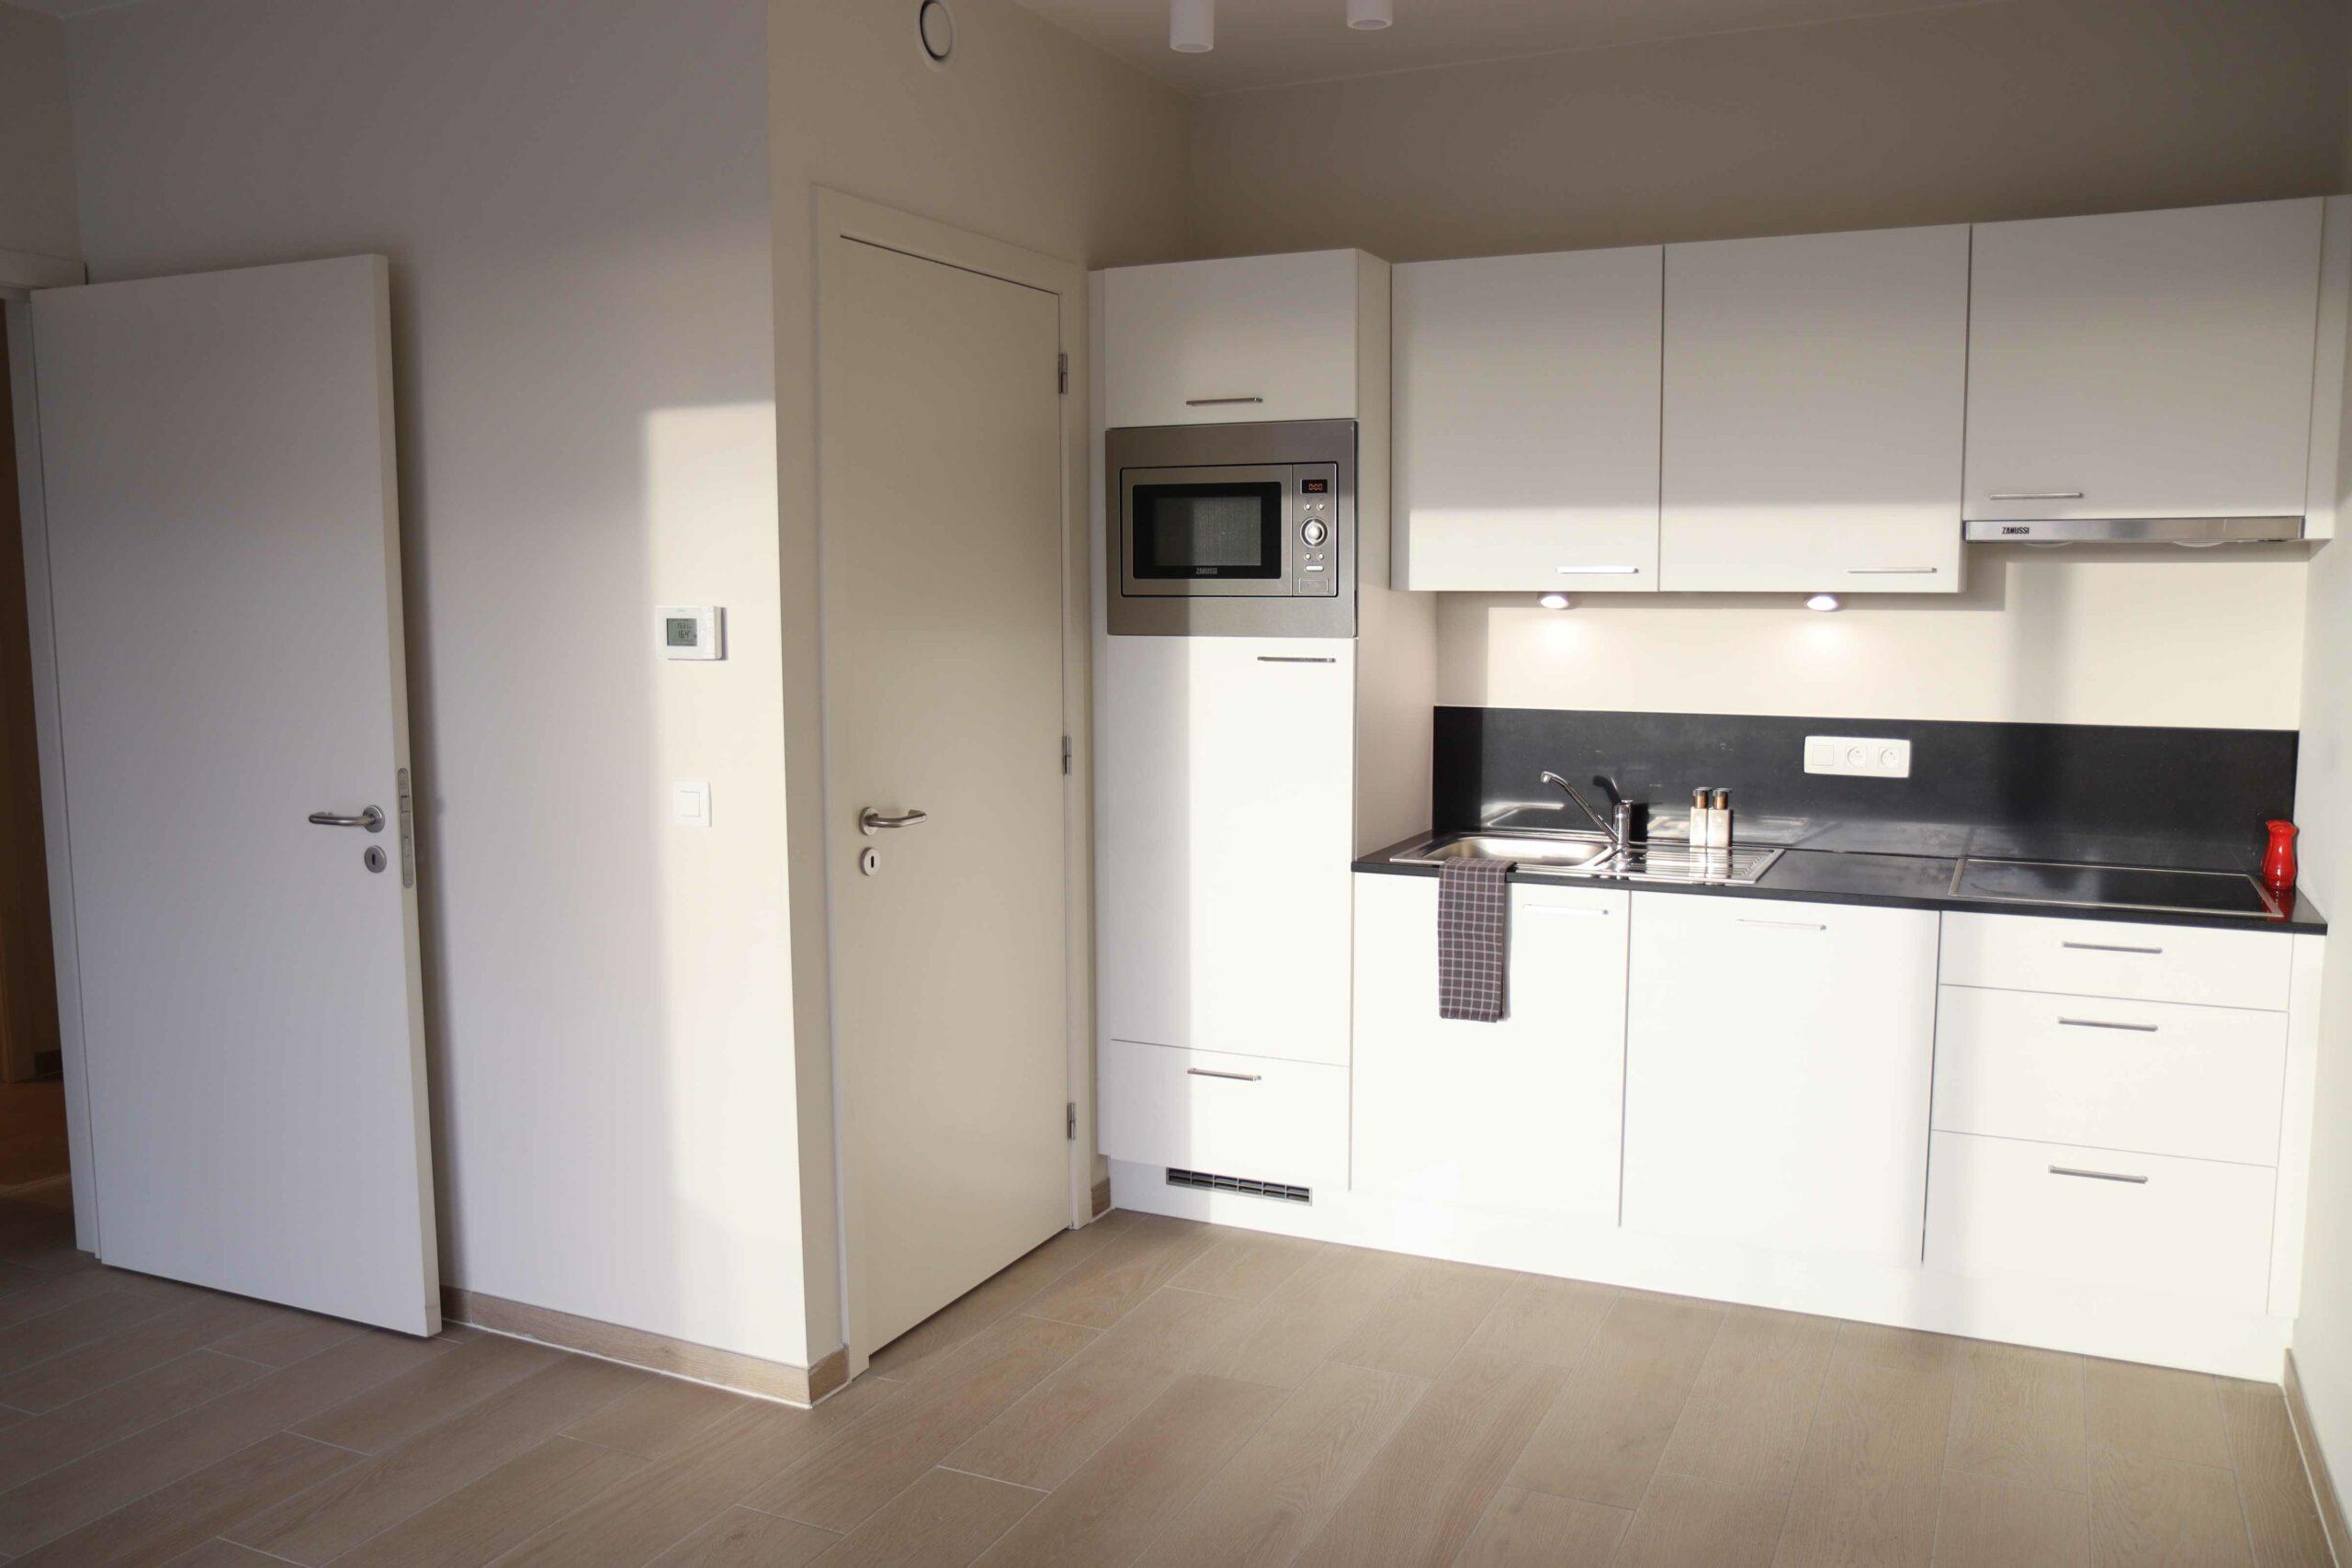 2 keuken